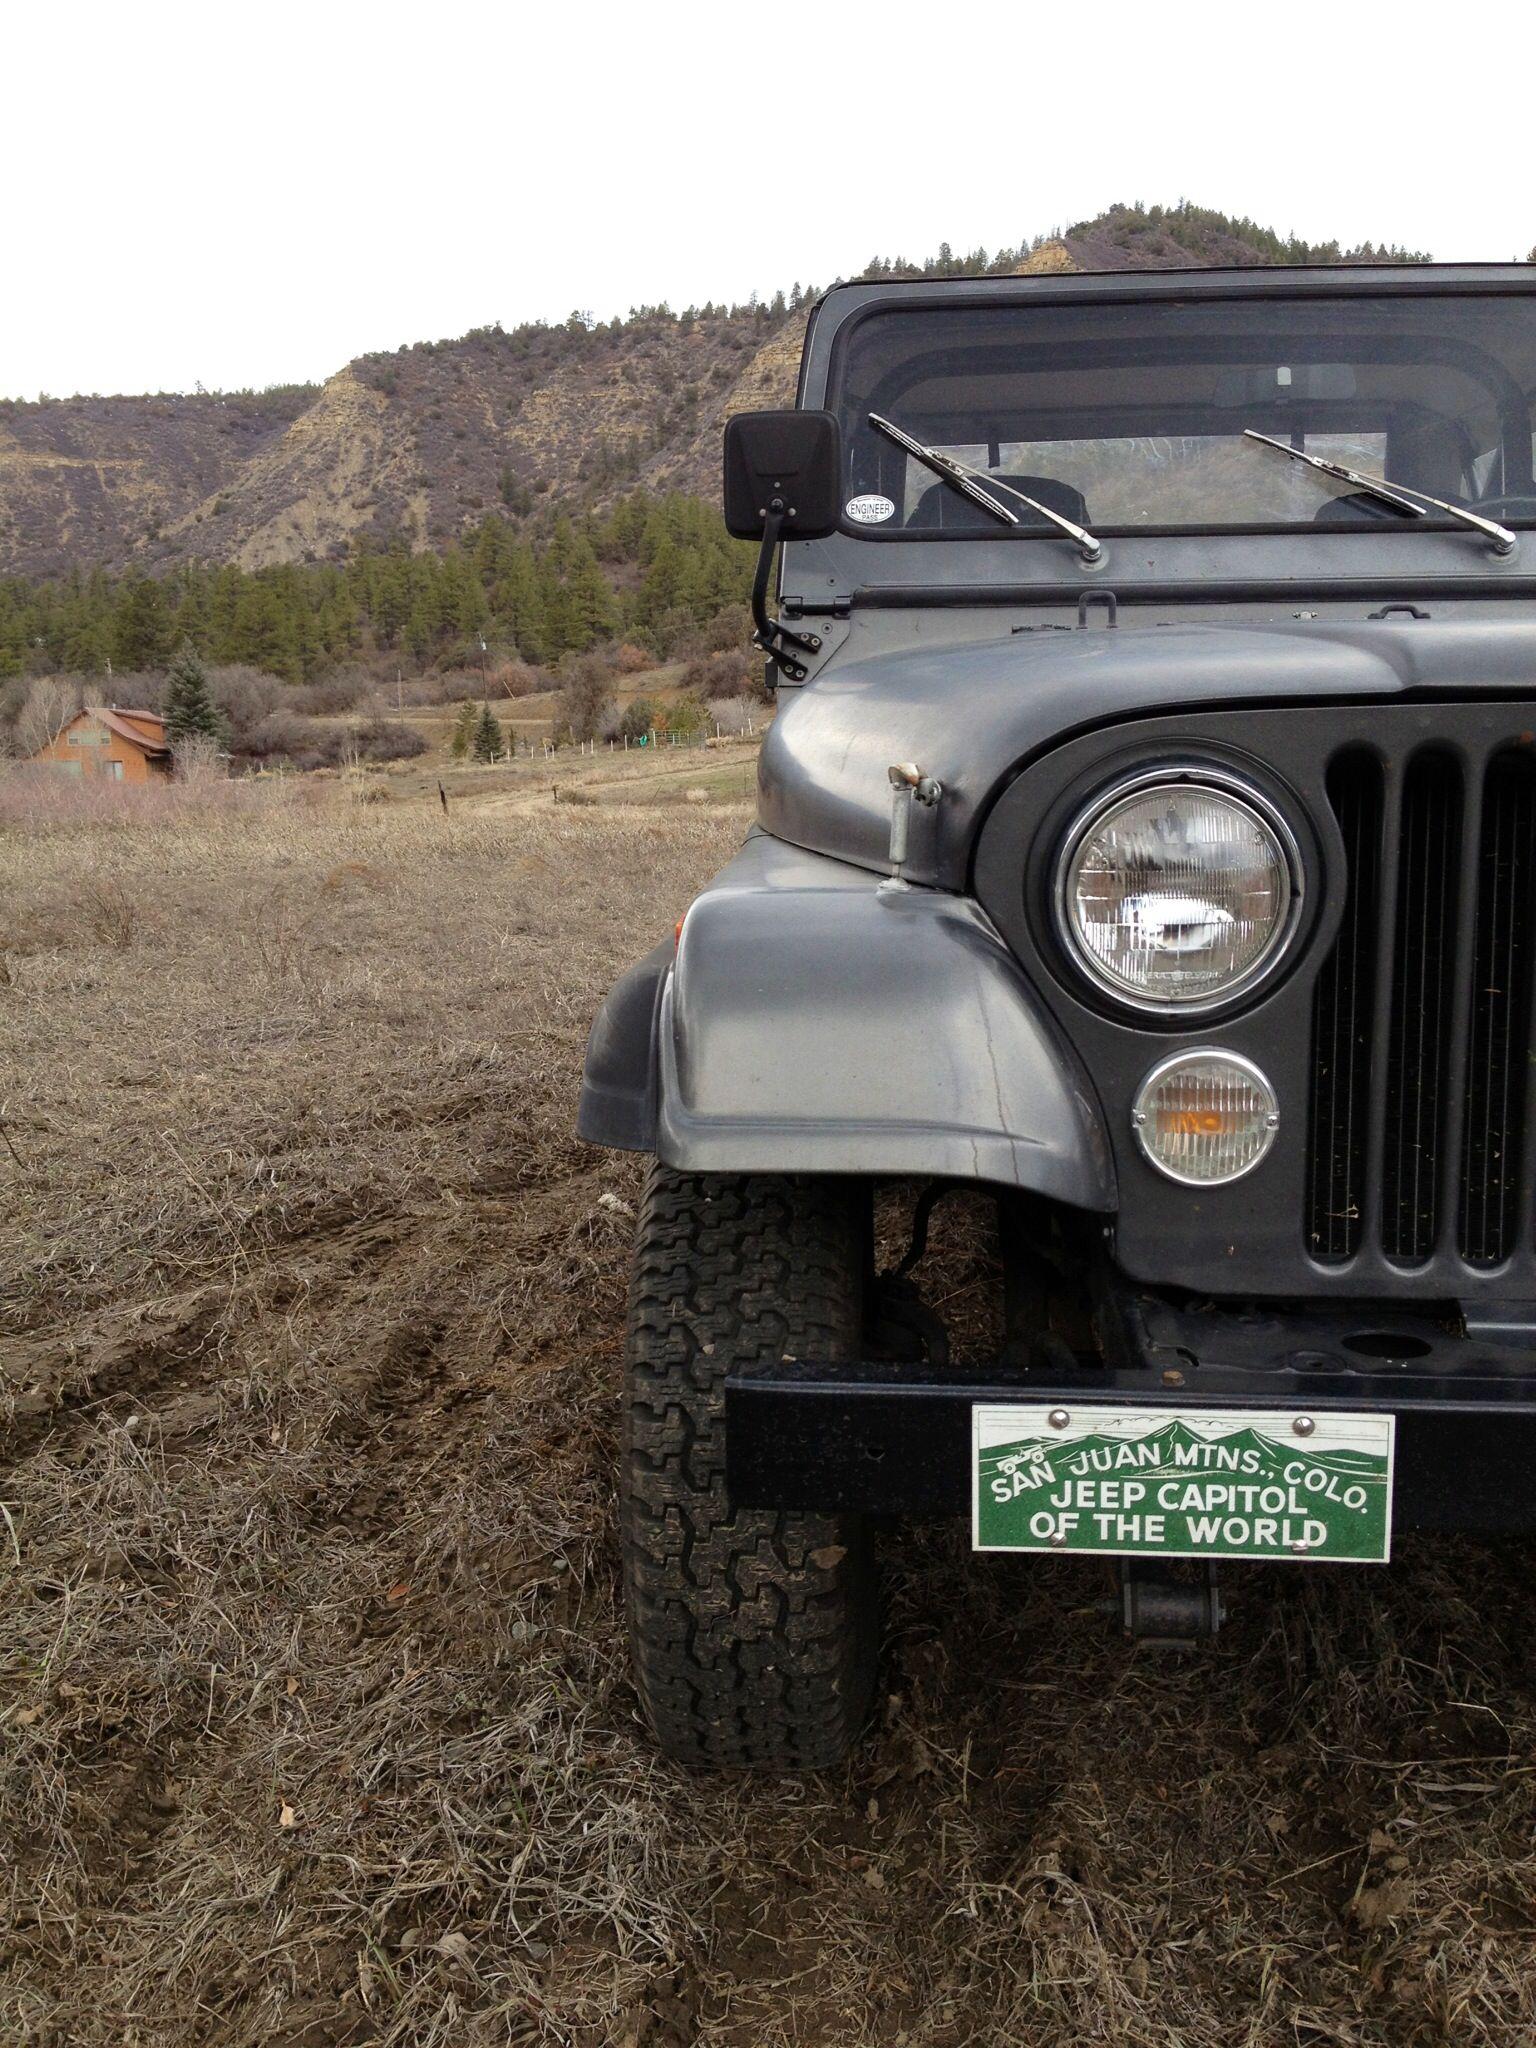 Jeep Cj 7 In Pagosa Springs Colorado Jeep Cj Jeep Antique Cars